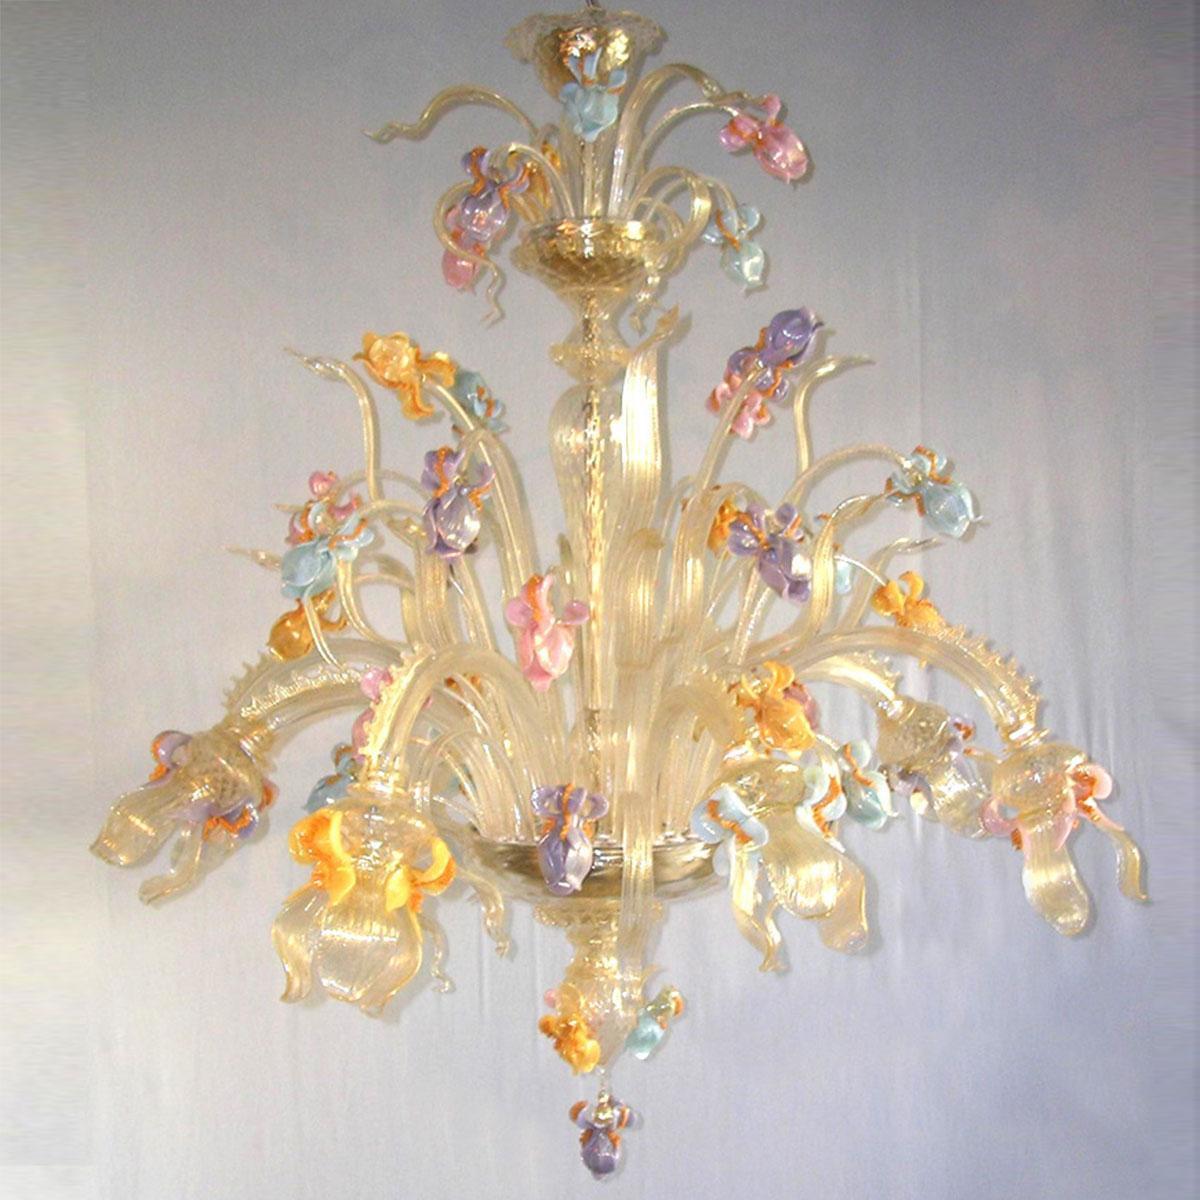 """Iris Dorato"" Murano glas Kronleuchter - 6 flammig - gold"